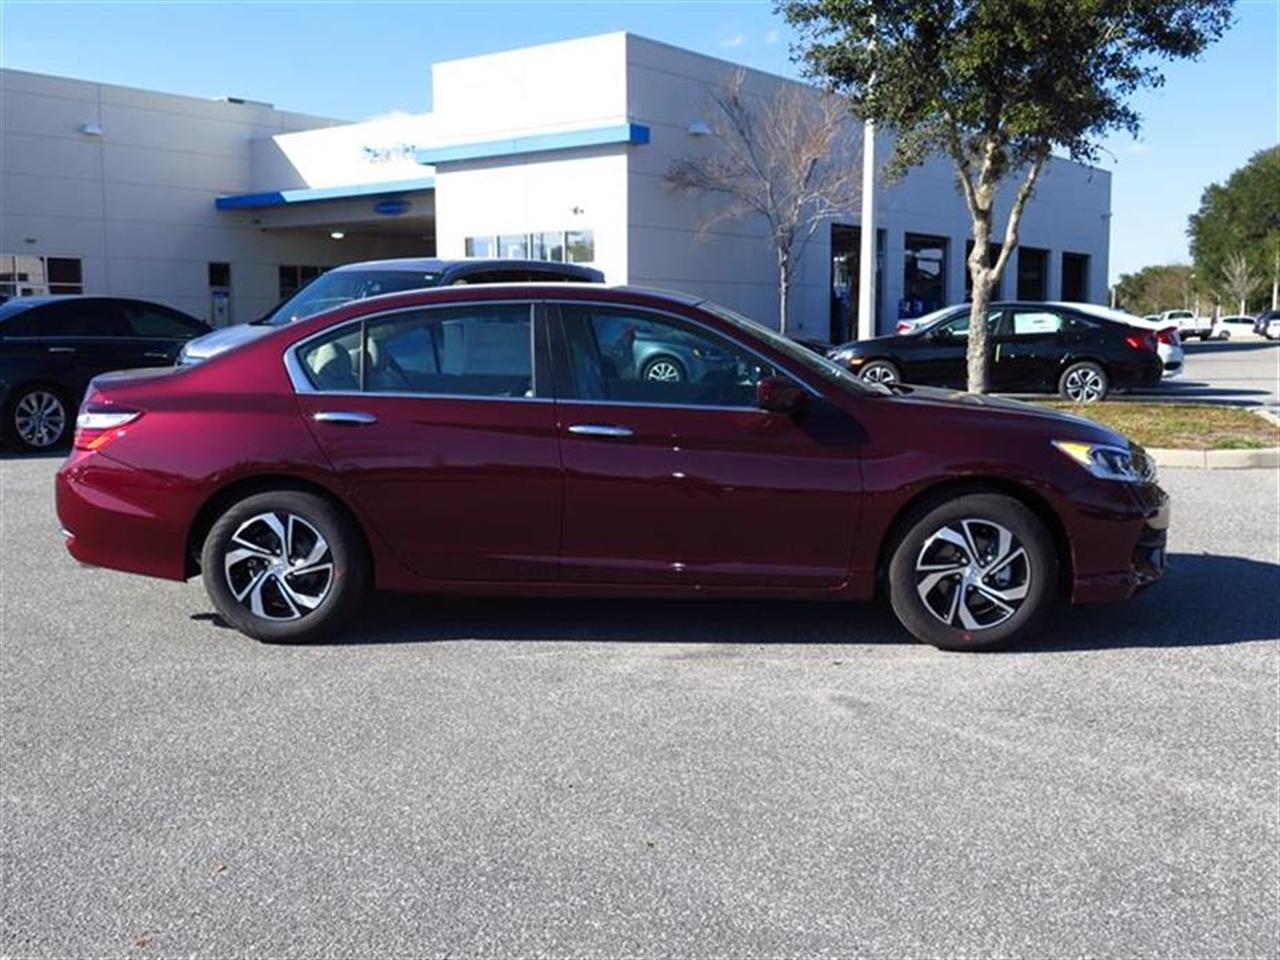 New 2016 Honda Accord, $23840